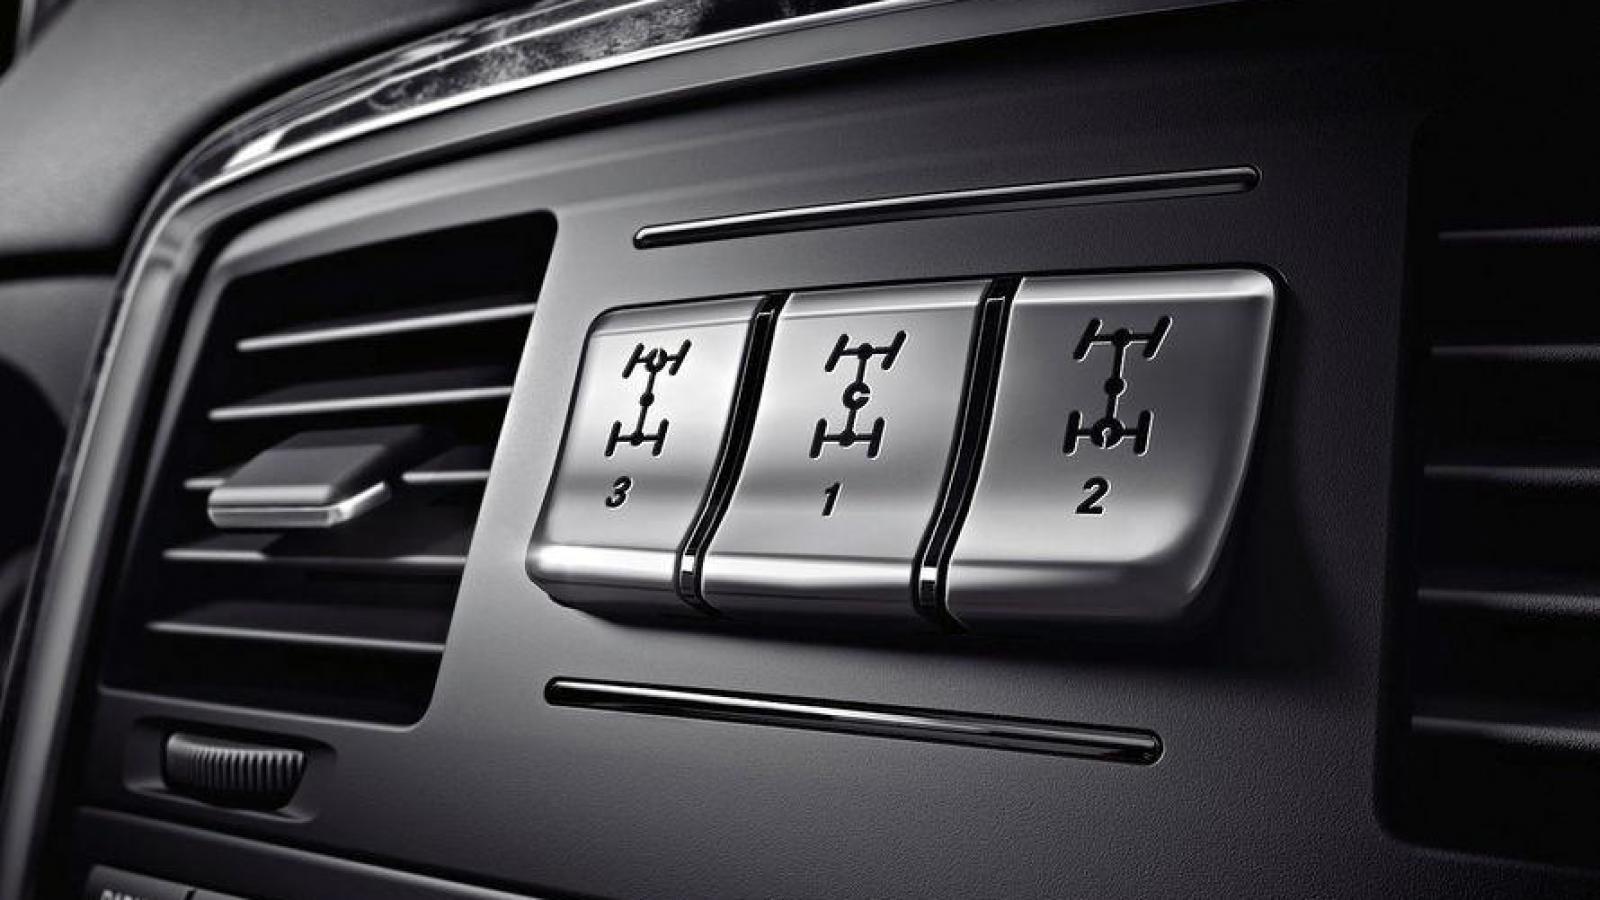 Mercedes benz g230 2000 car classifieds software autos for Mercedes benz software